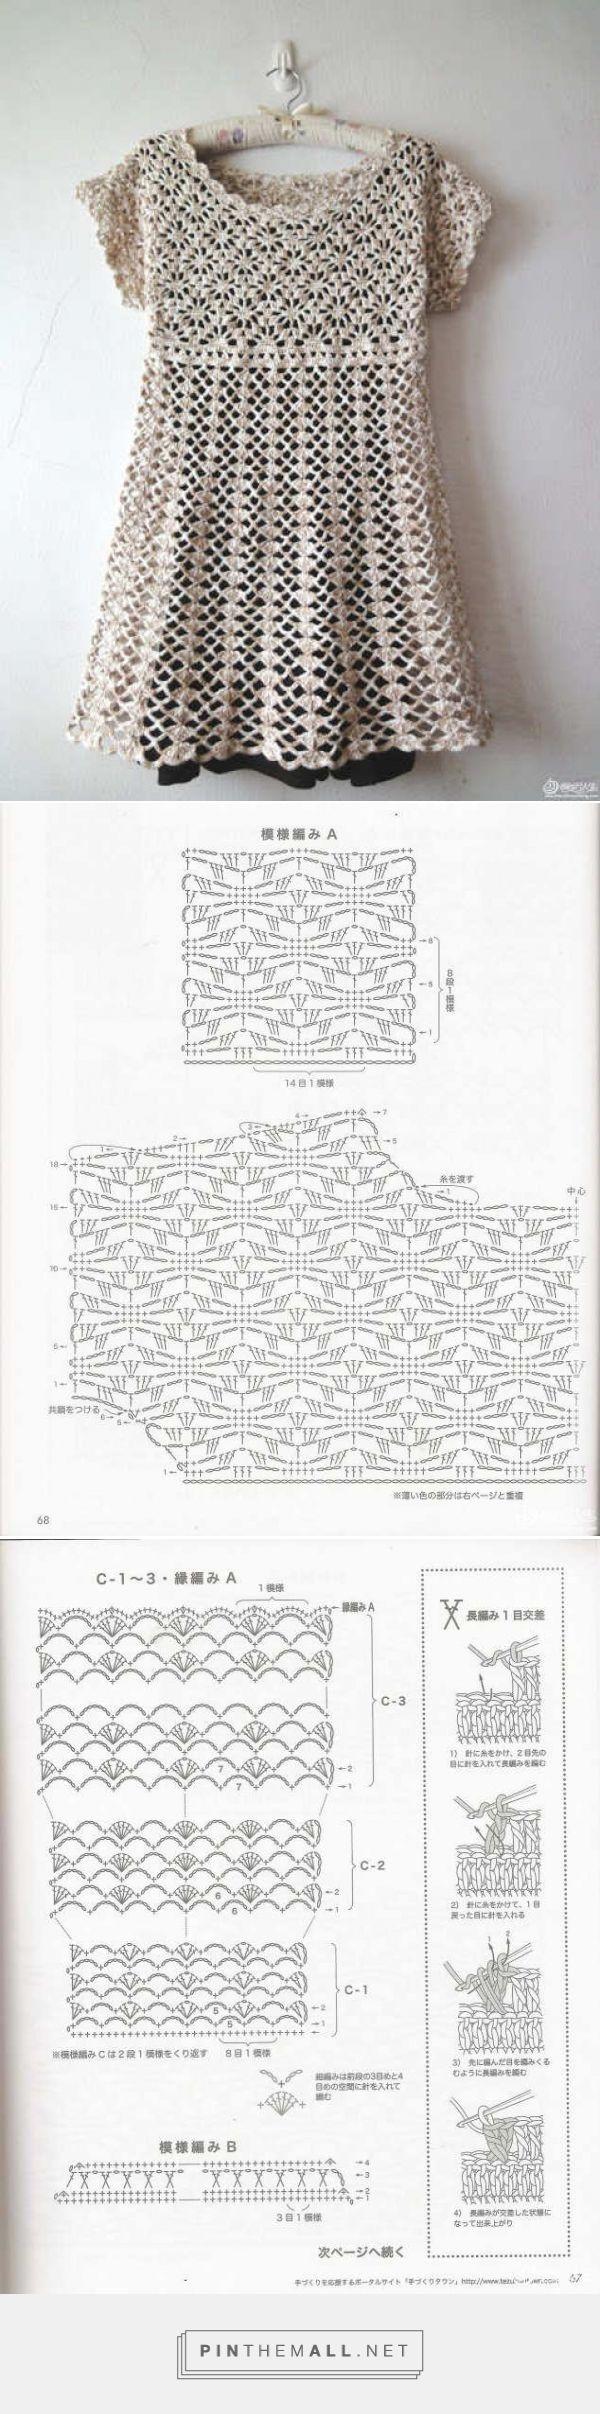 Pretty crochet lace top with spiderweb stitch yoke and shell stitch ...